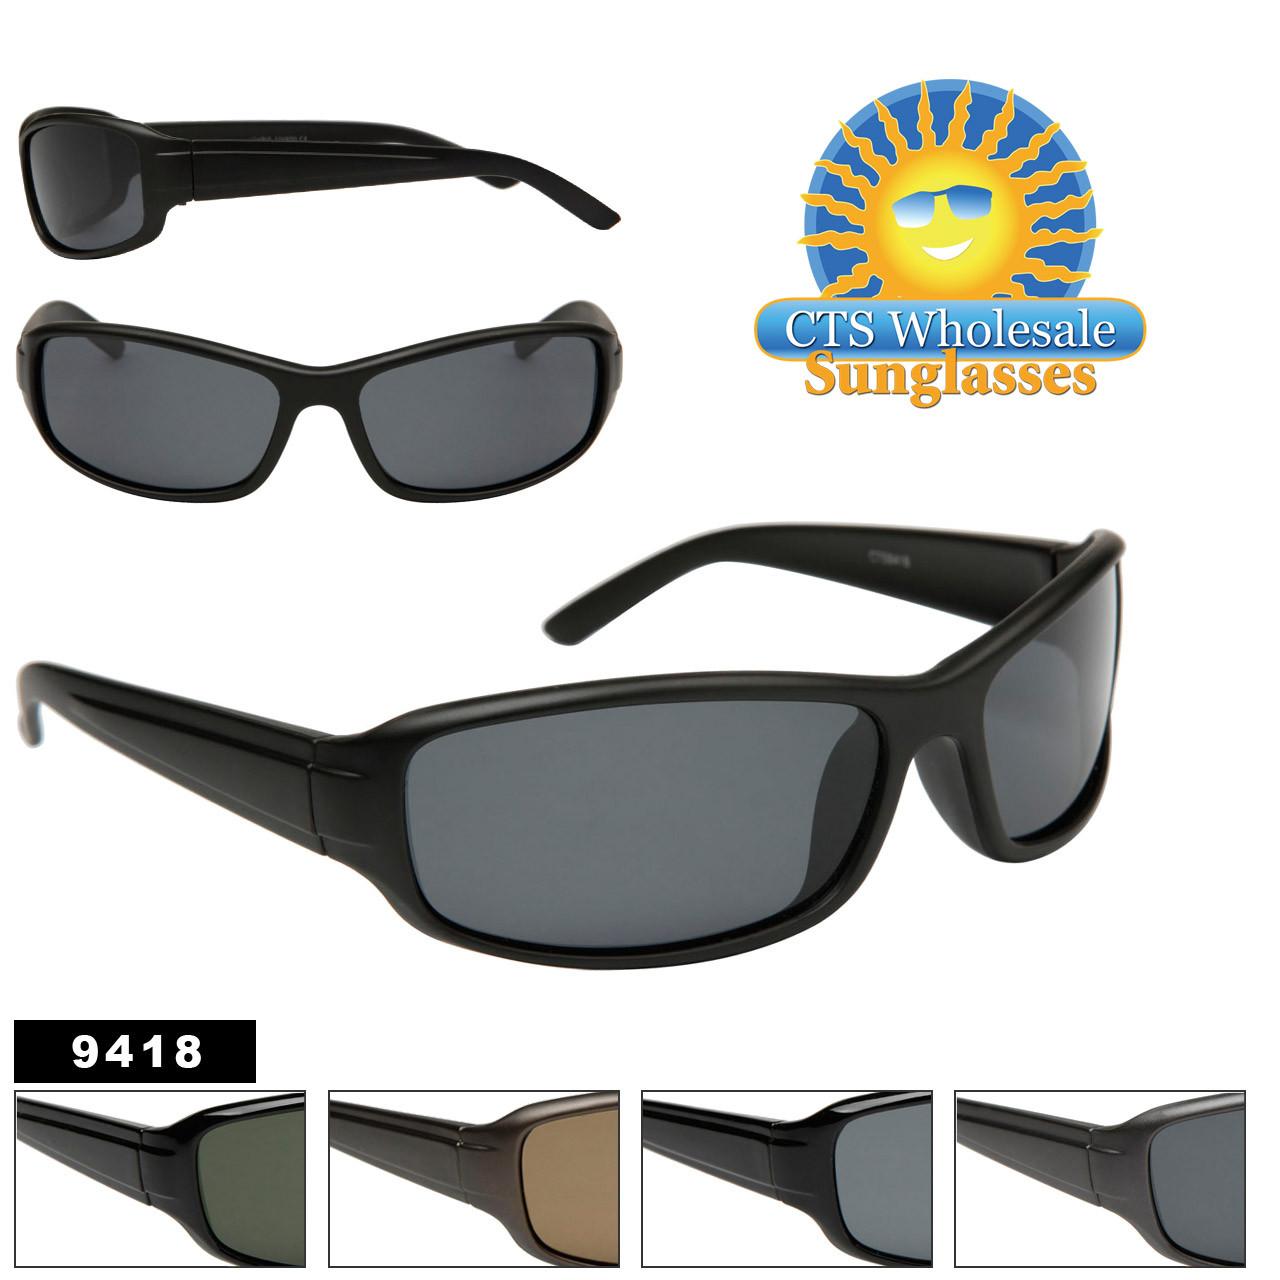 #9418 Polarized Sports Sunglasses